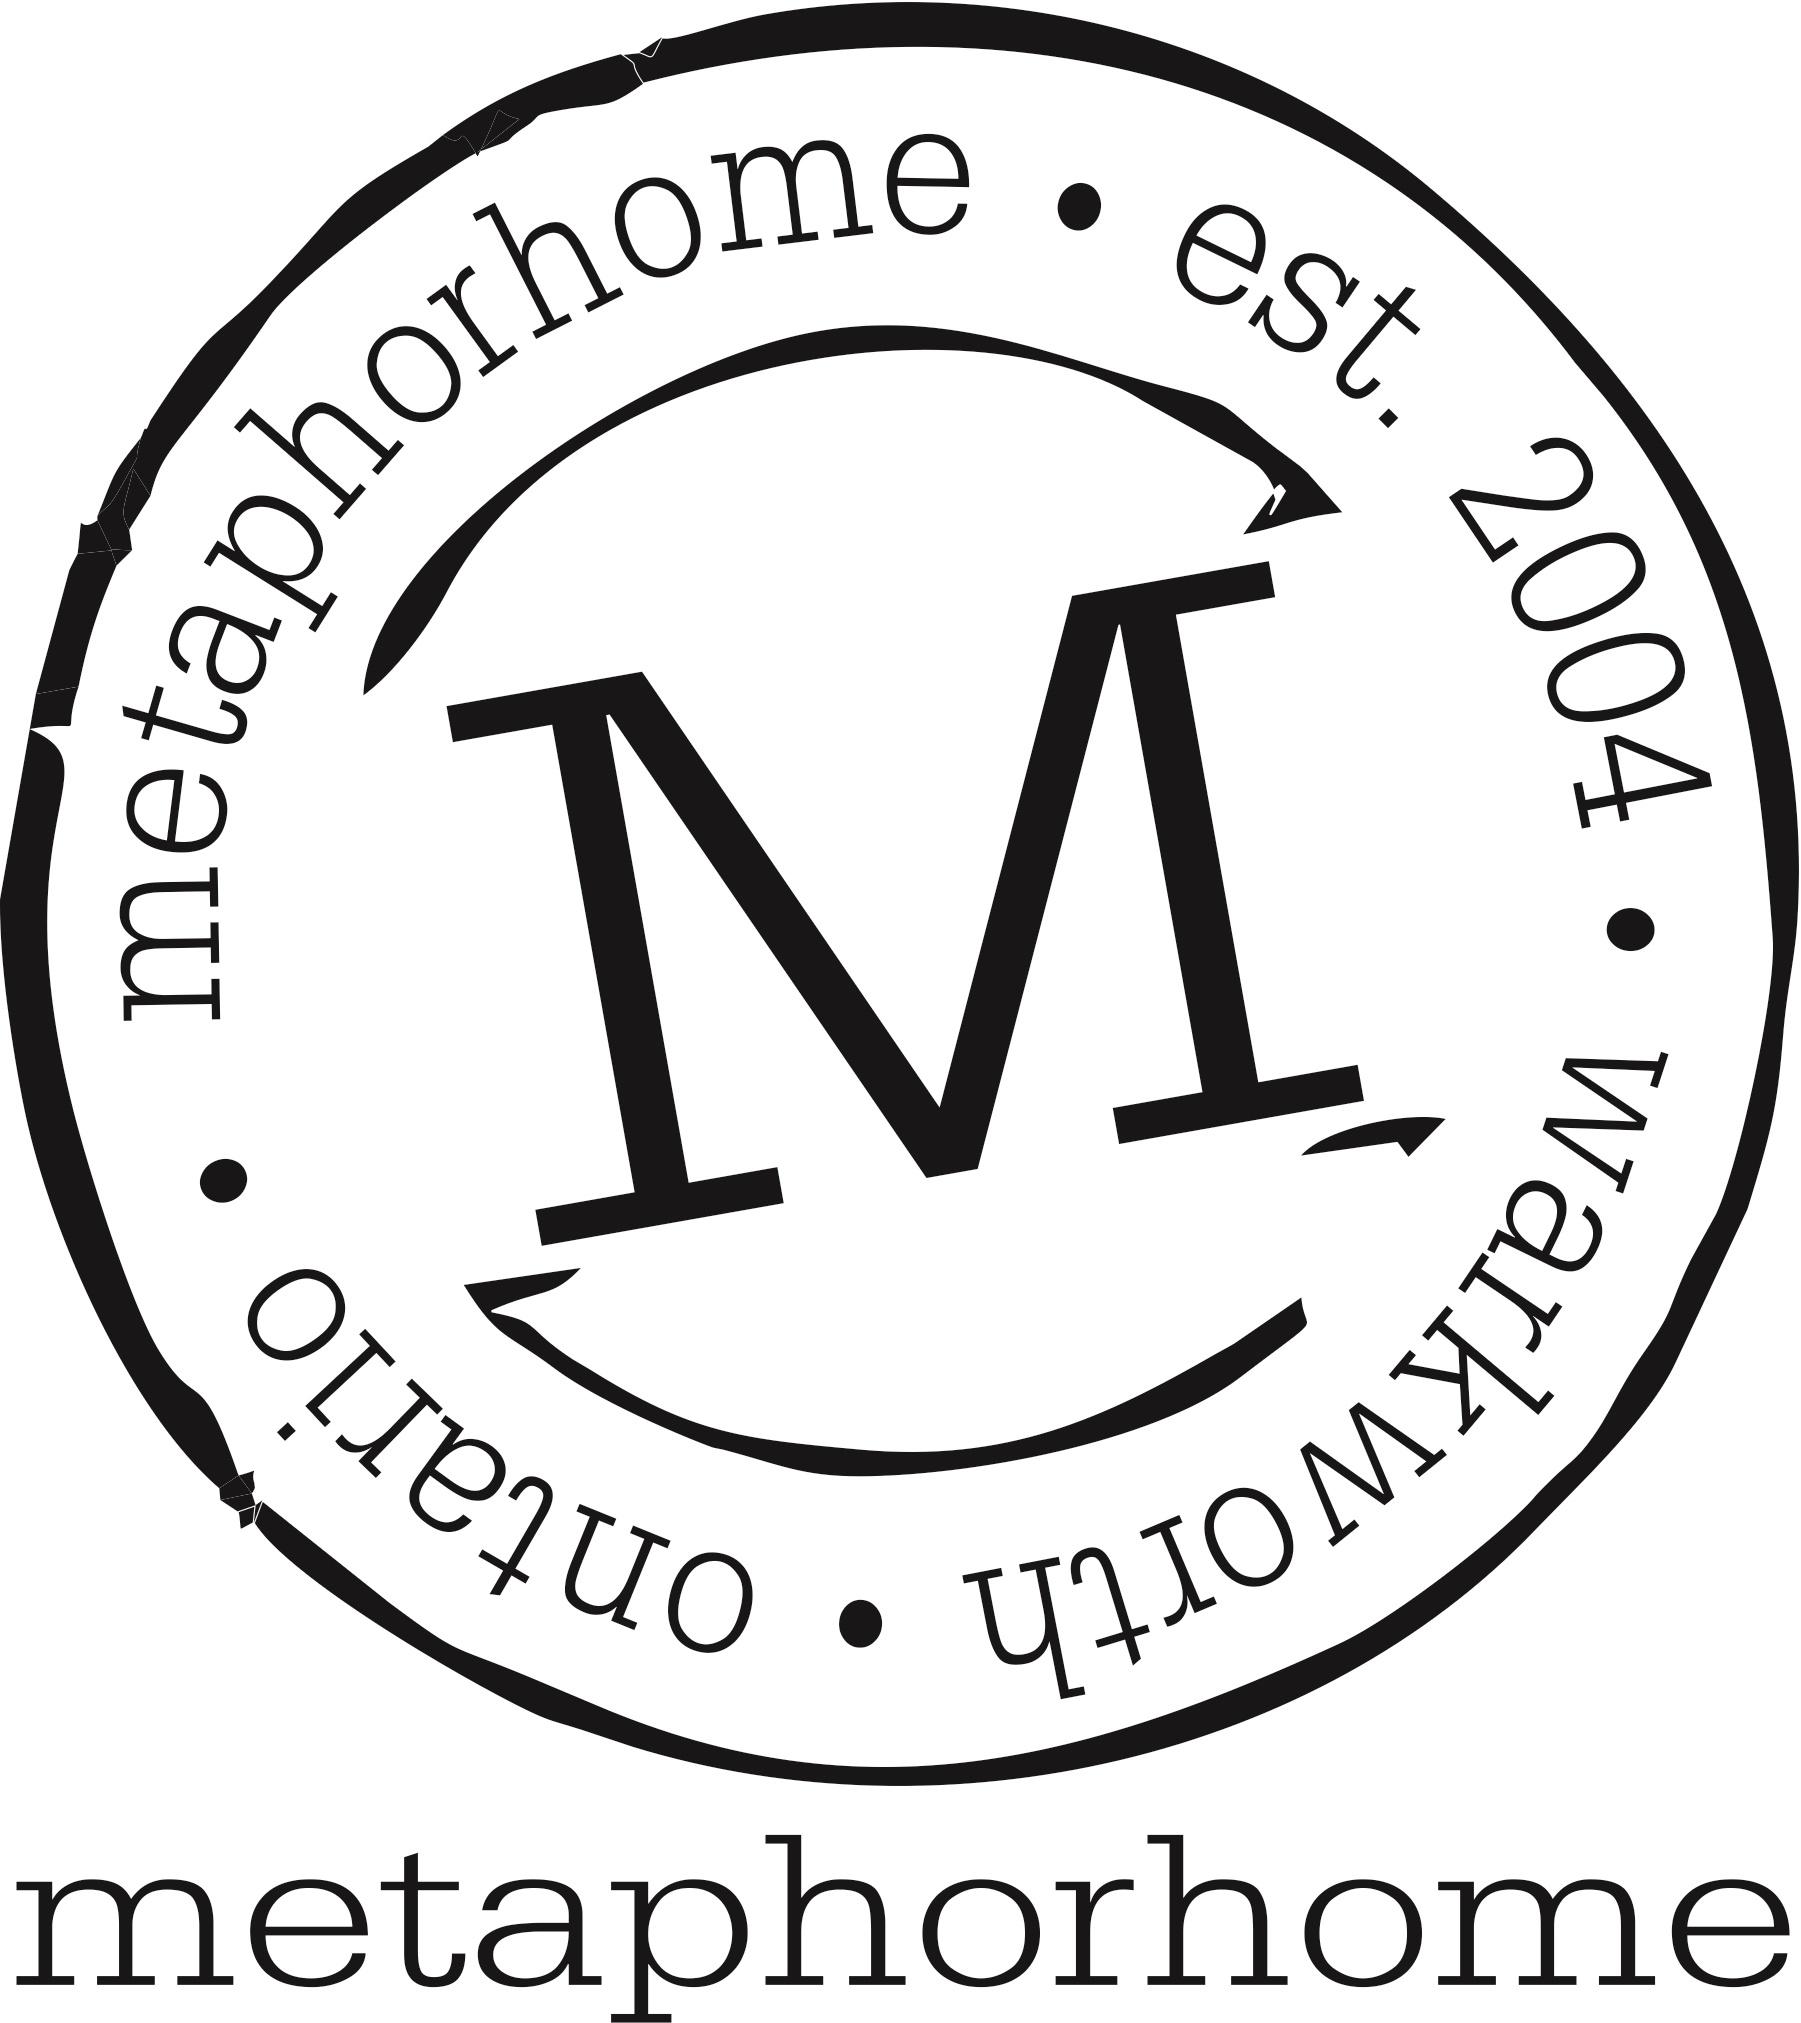 metaphorhome logo round 2018.jpg